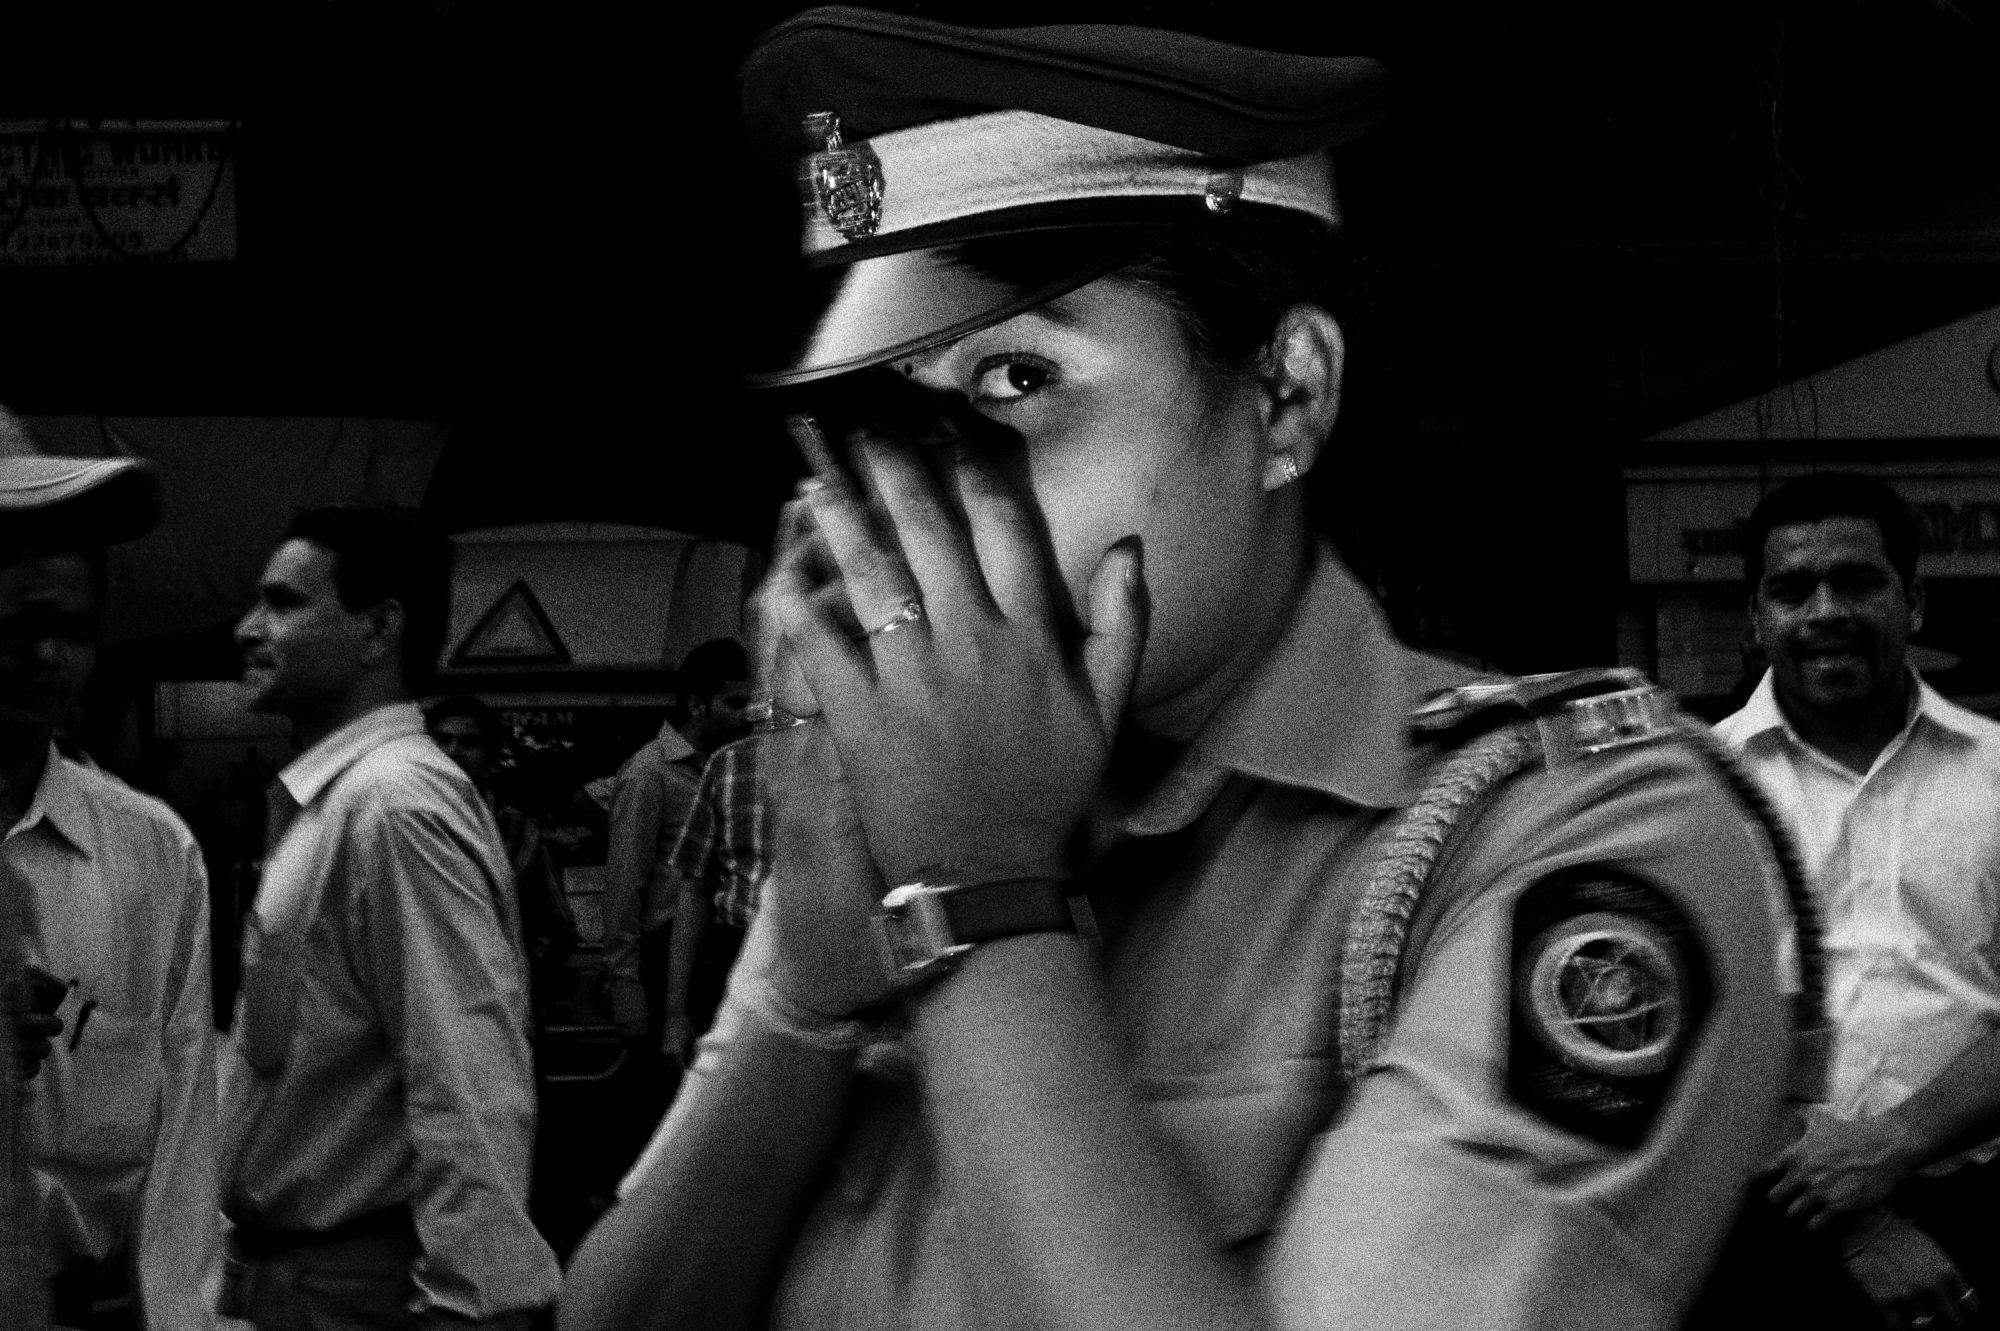 Mumbai, 2011. Leica M9 x Flash